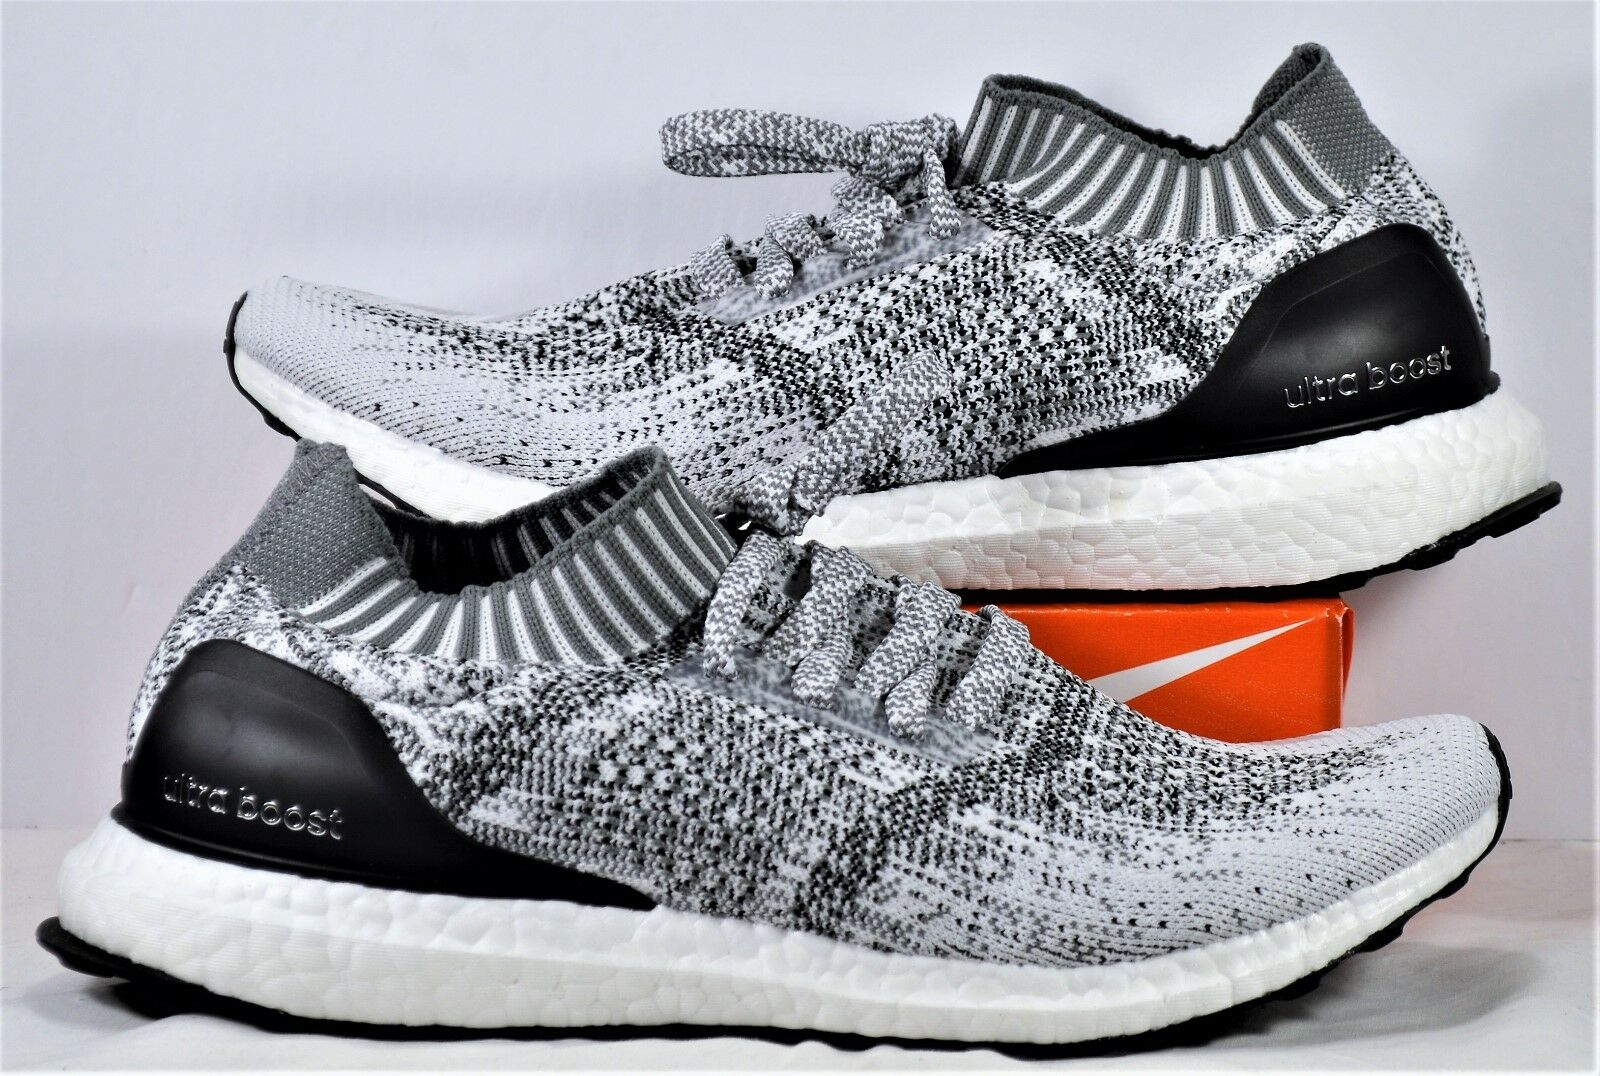 Adidas Ultra Boost Uncaged Black & White Grey Oreo Running Shoe Sz 9 NEW CG4095